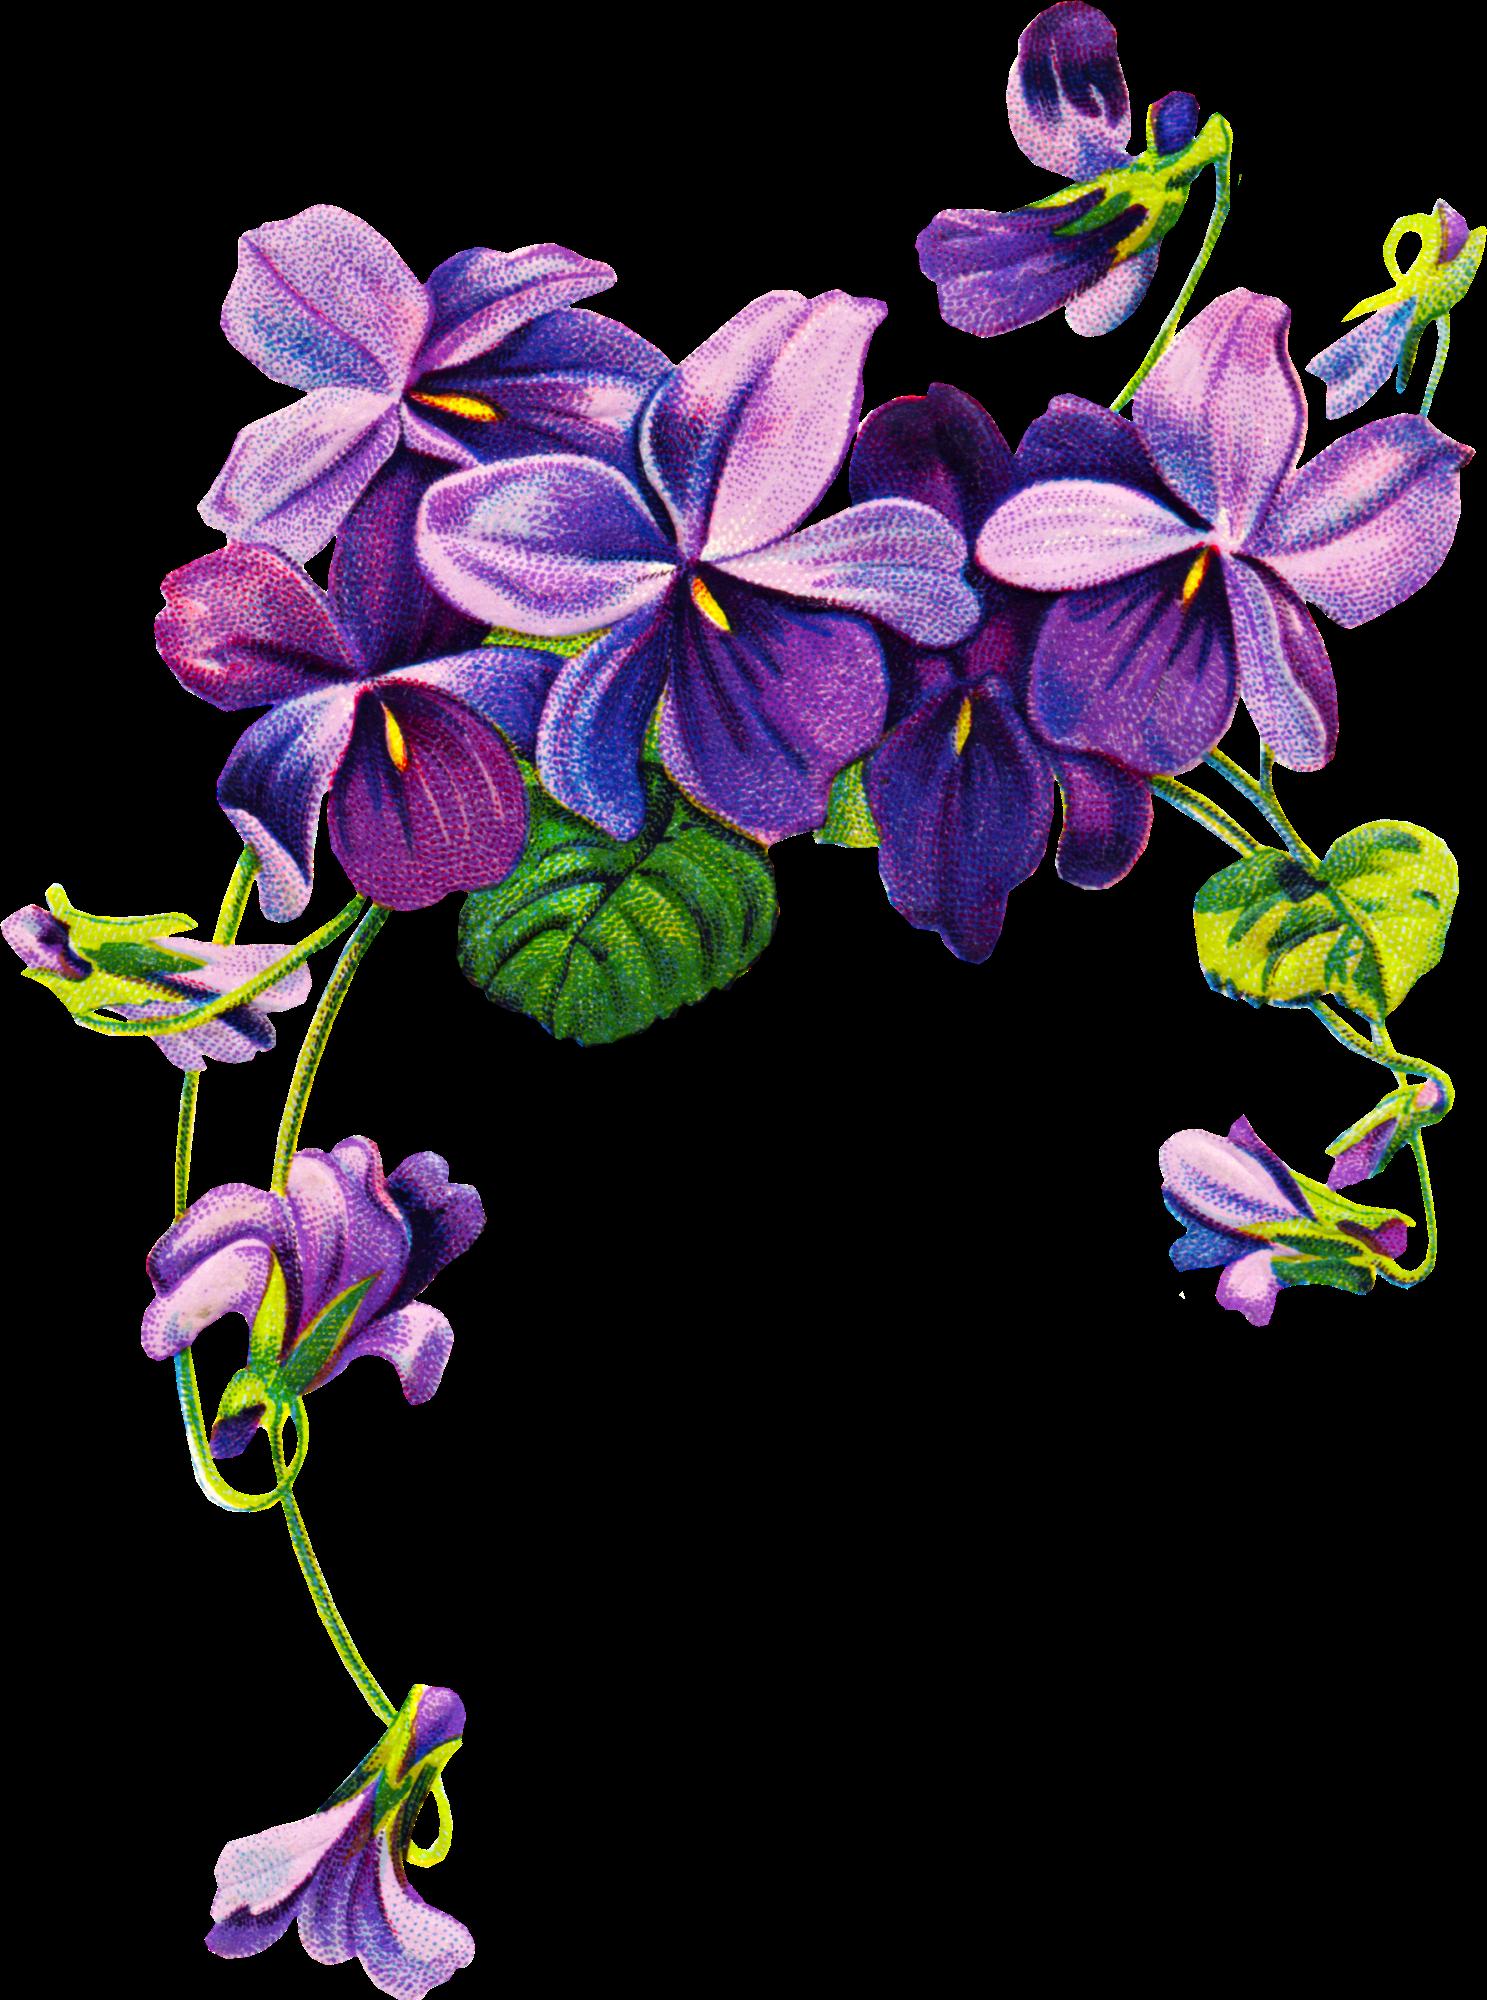 Violets Vintage Clipart-Violets Vintage Clipart-11